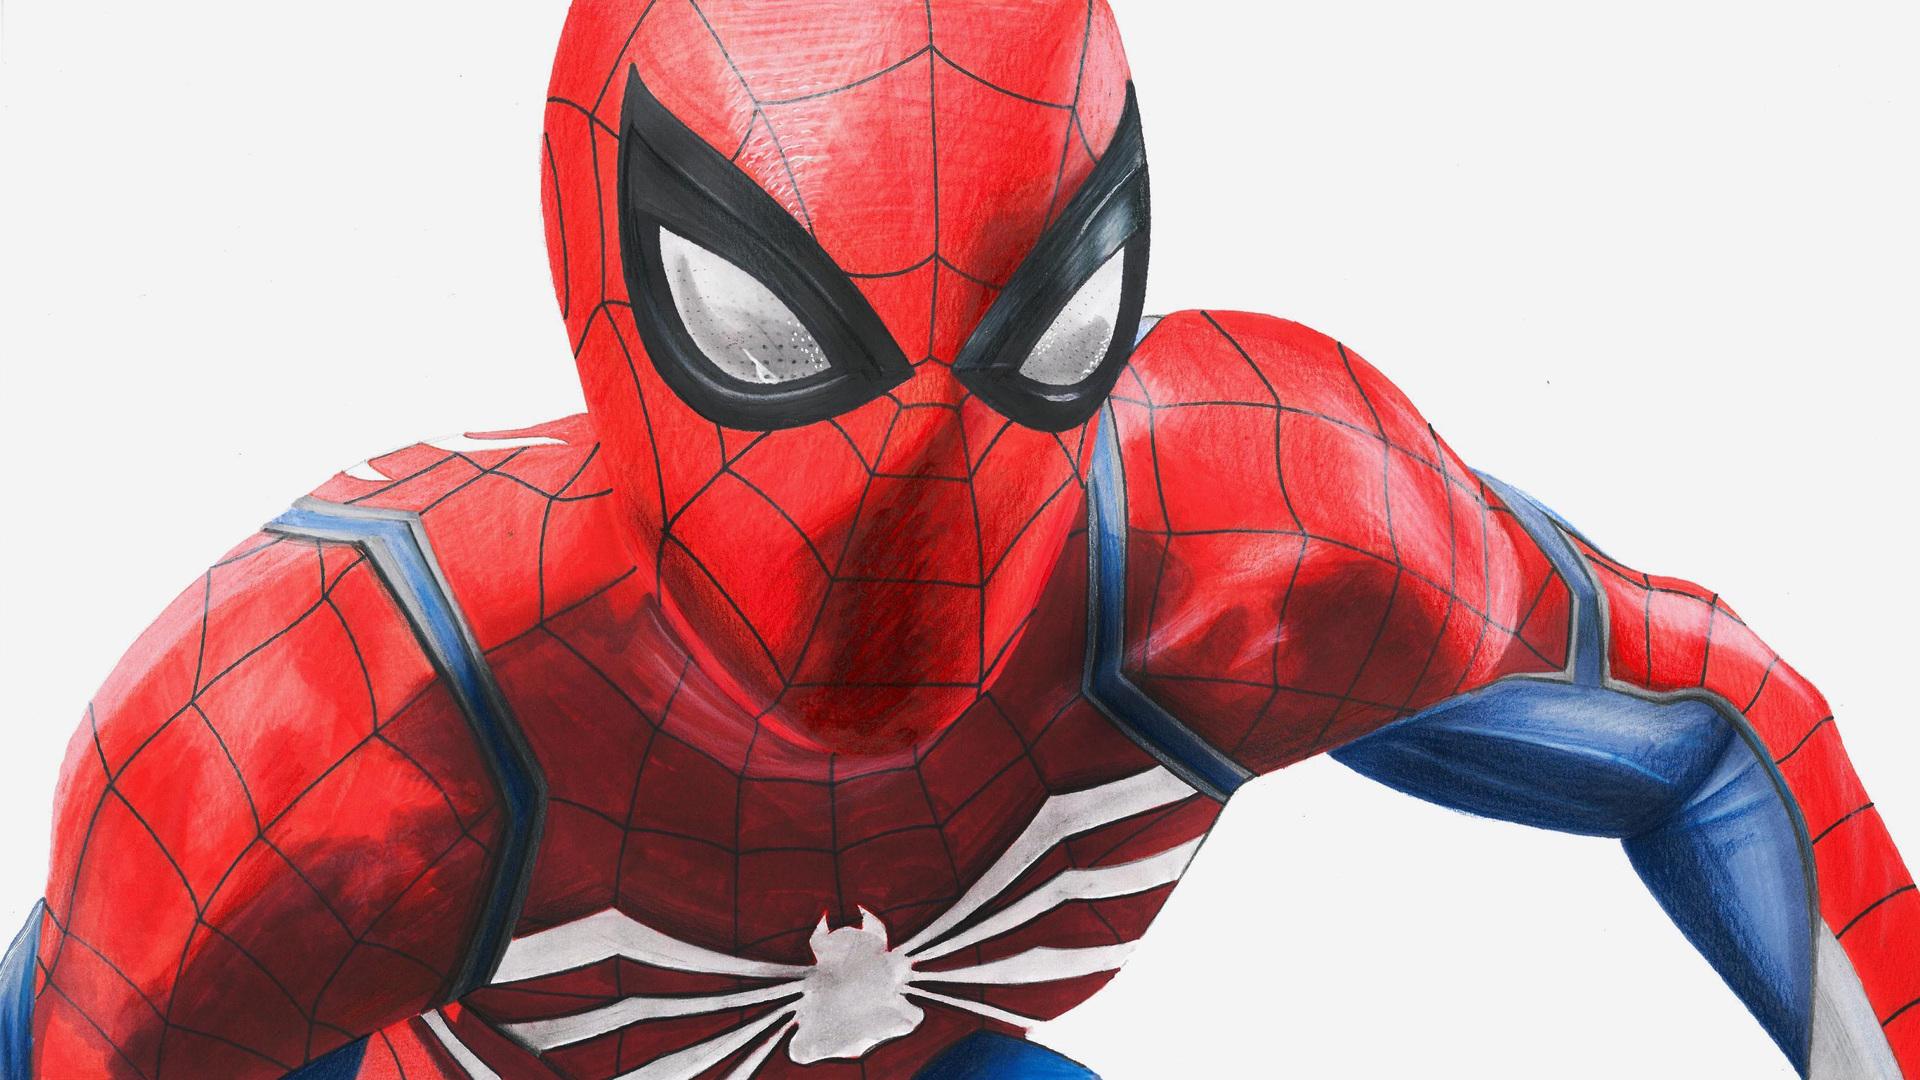 1920x1080 Spiderman 4k Artwork 2018 Laptop Full HD 1080P ...